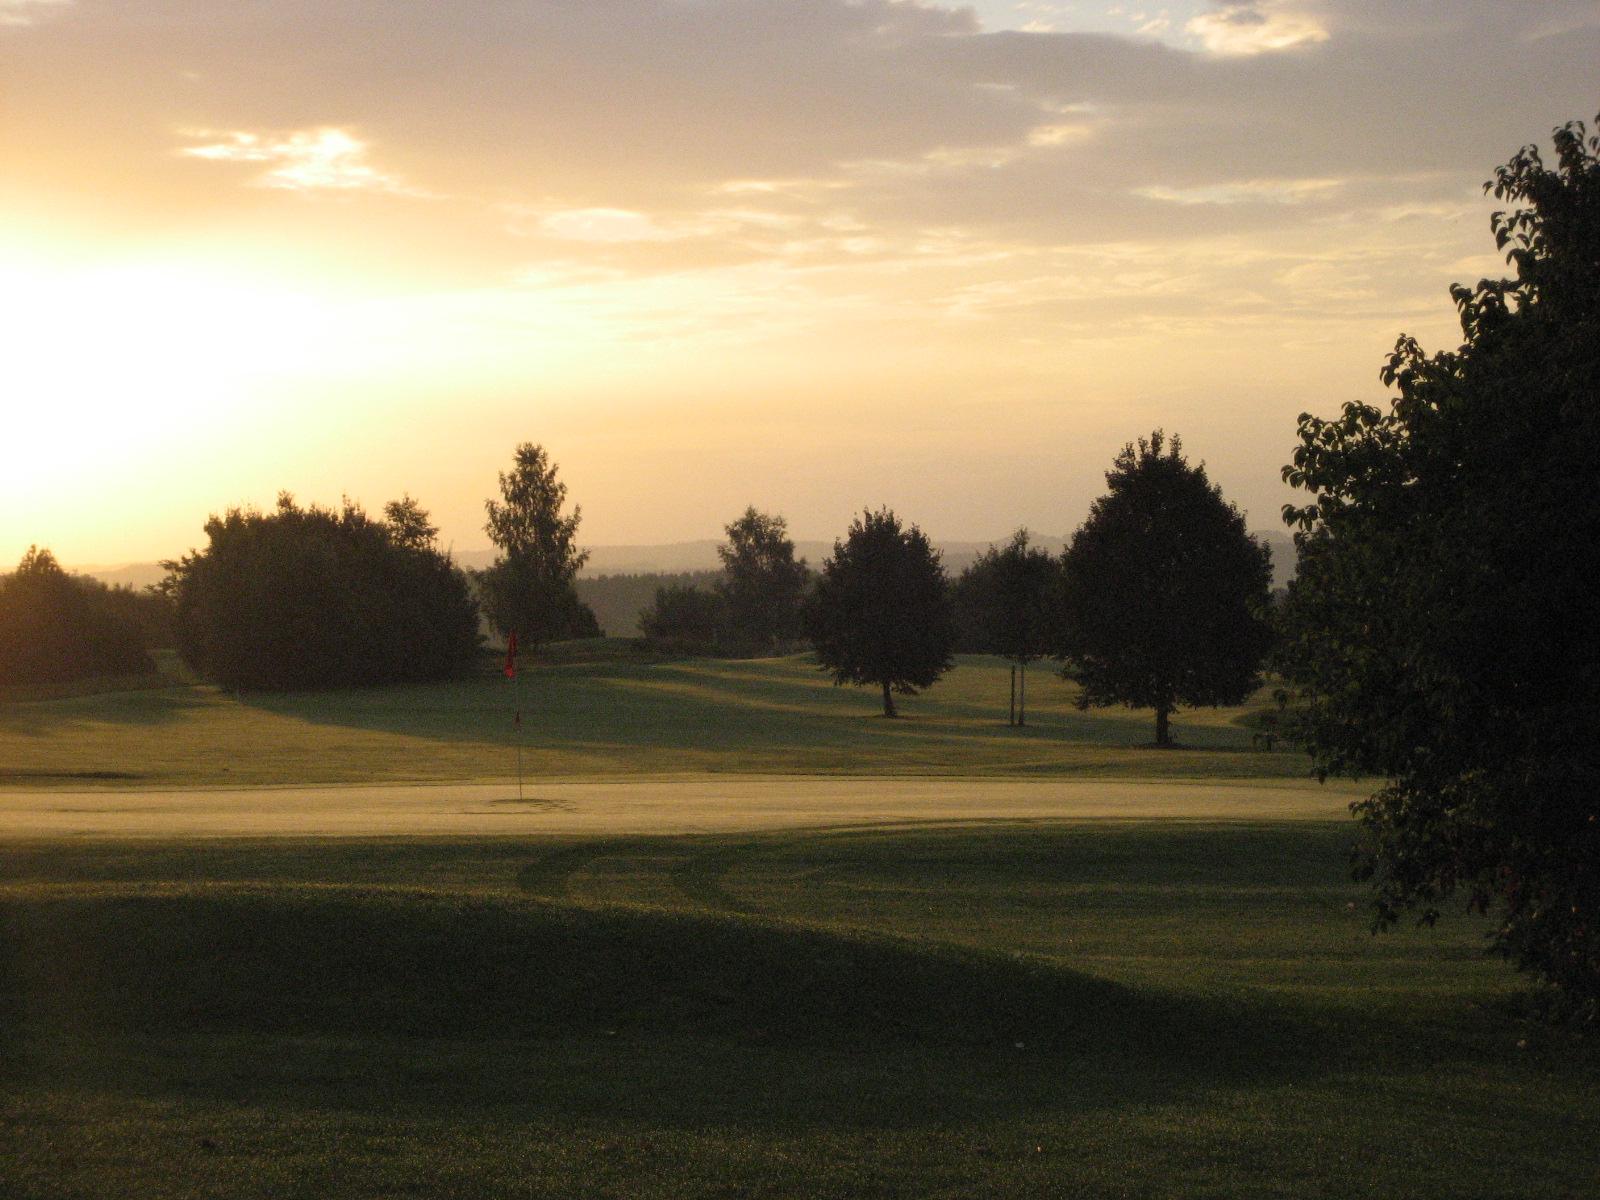 Overview of golf course named Golfclub Ravensburg e.V.